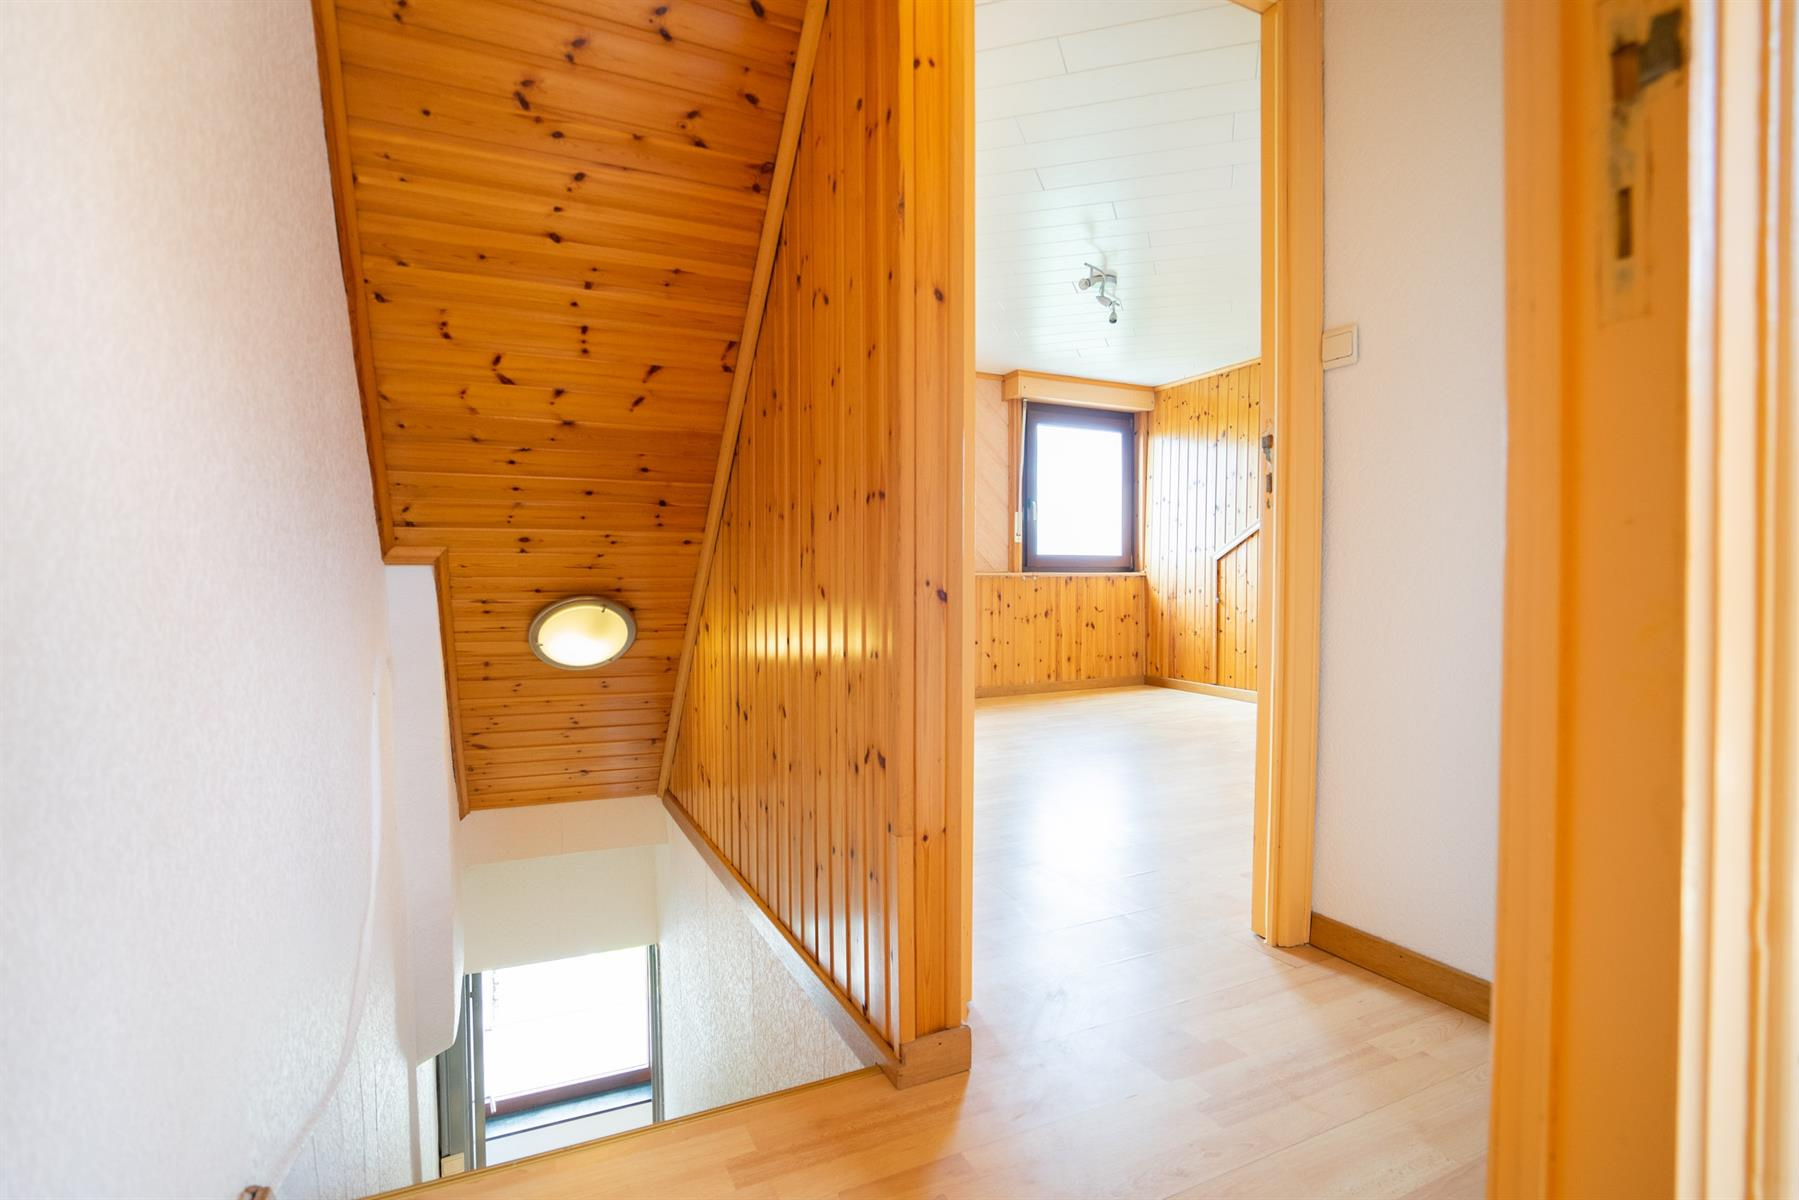 Maison - Beyne-Heusay Bellaire - #4422118-15